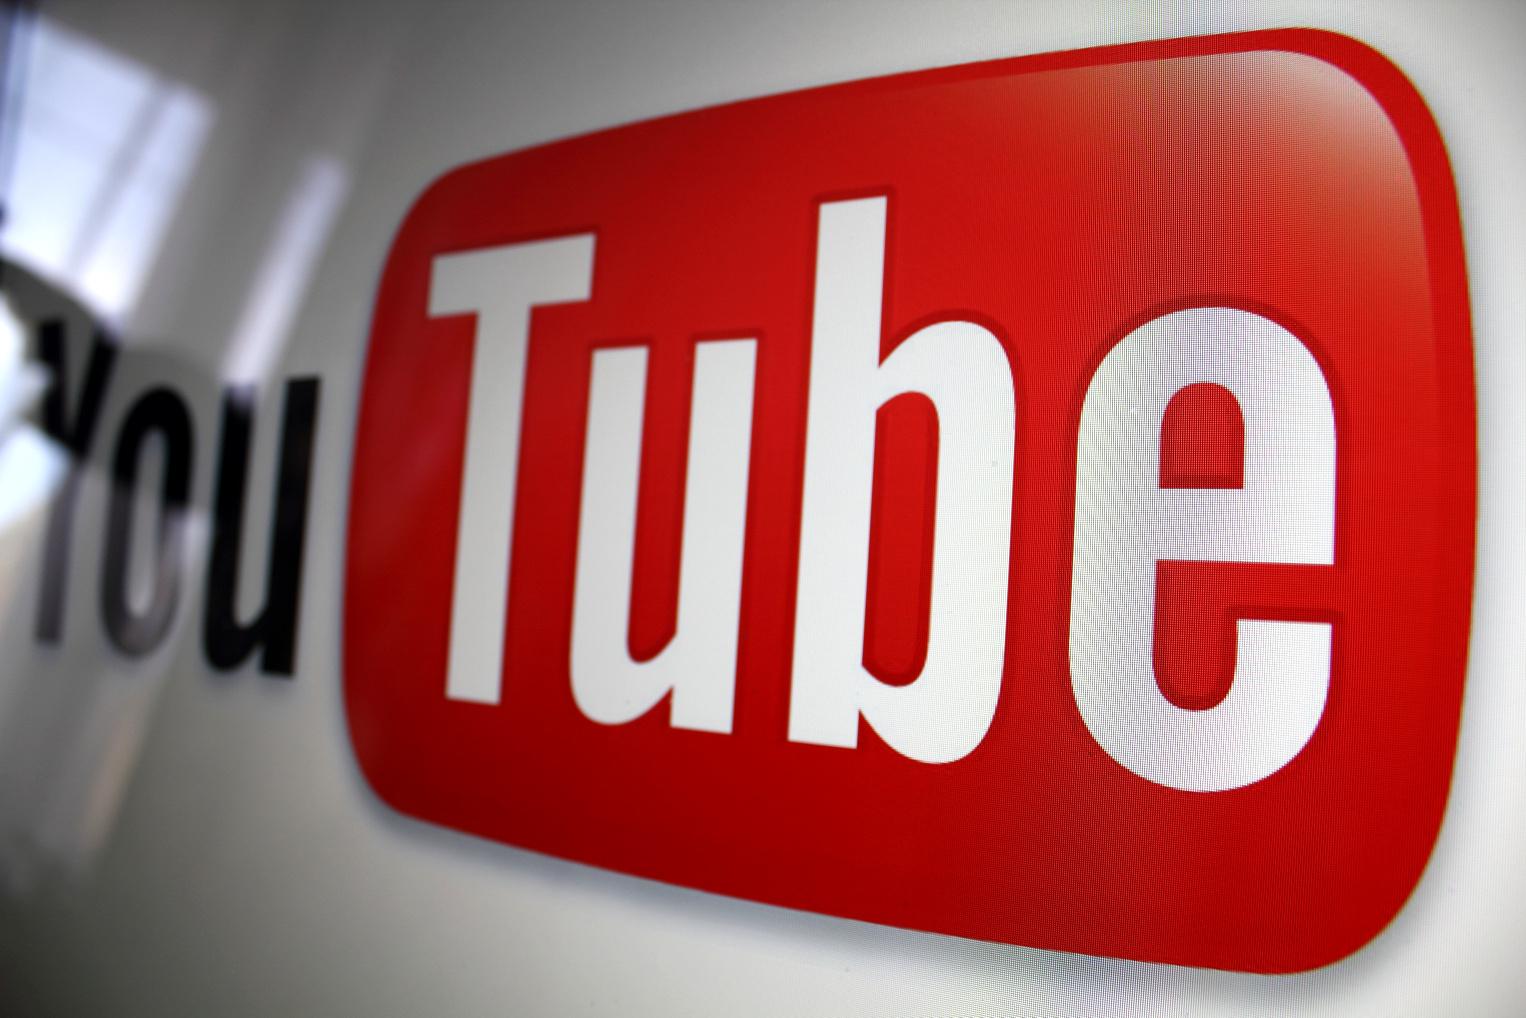 Youtube-Logo von https://www.flickr.com/photos/korosirego/4481461680